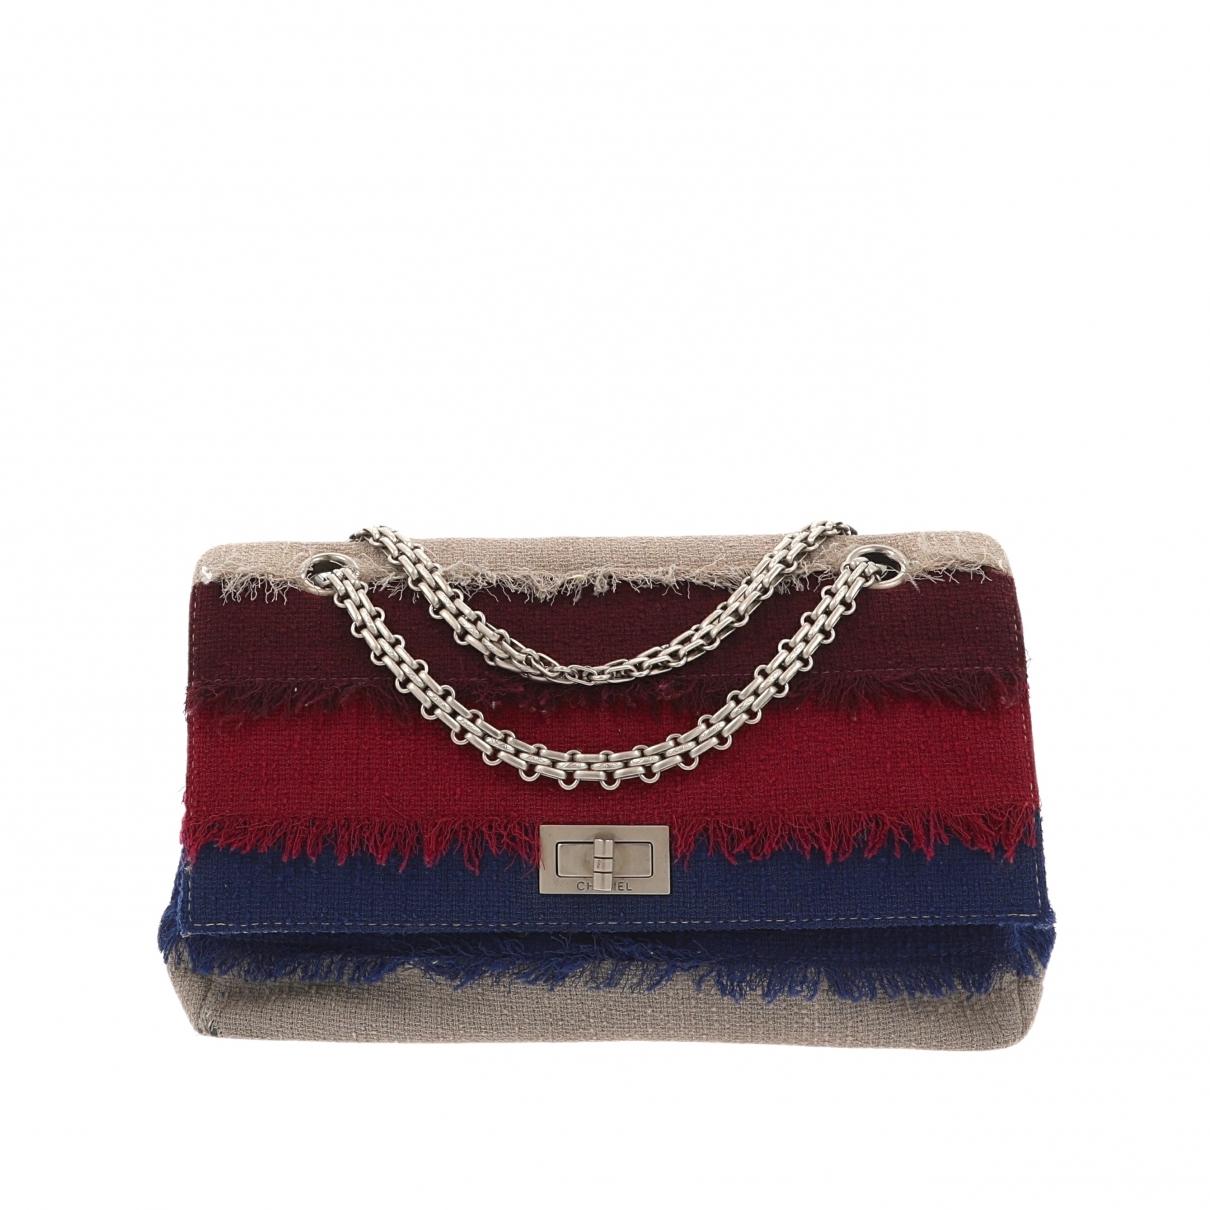 Chanel 2.55 Multicolour Tweed handbag for Women \N